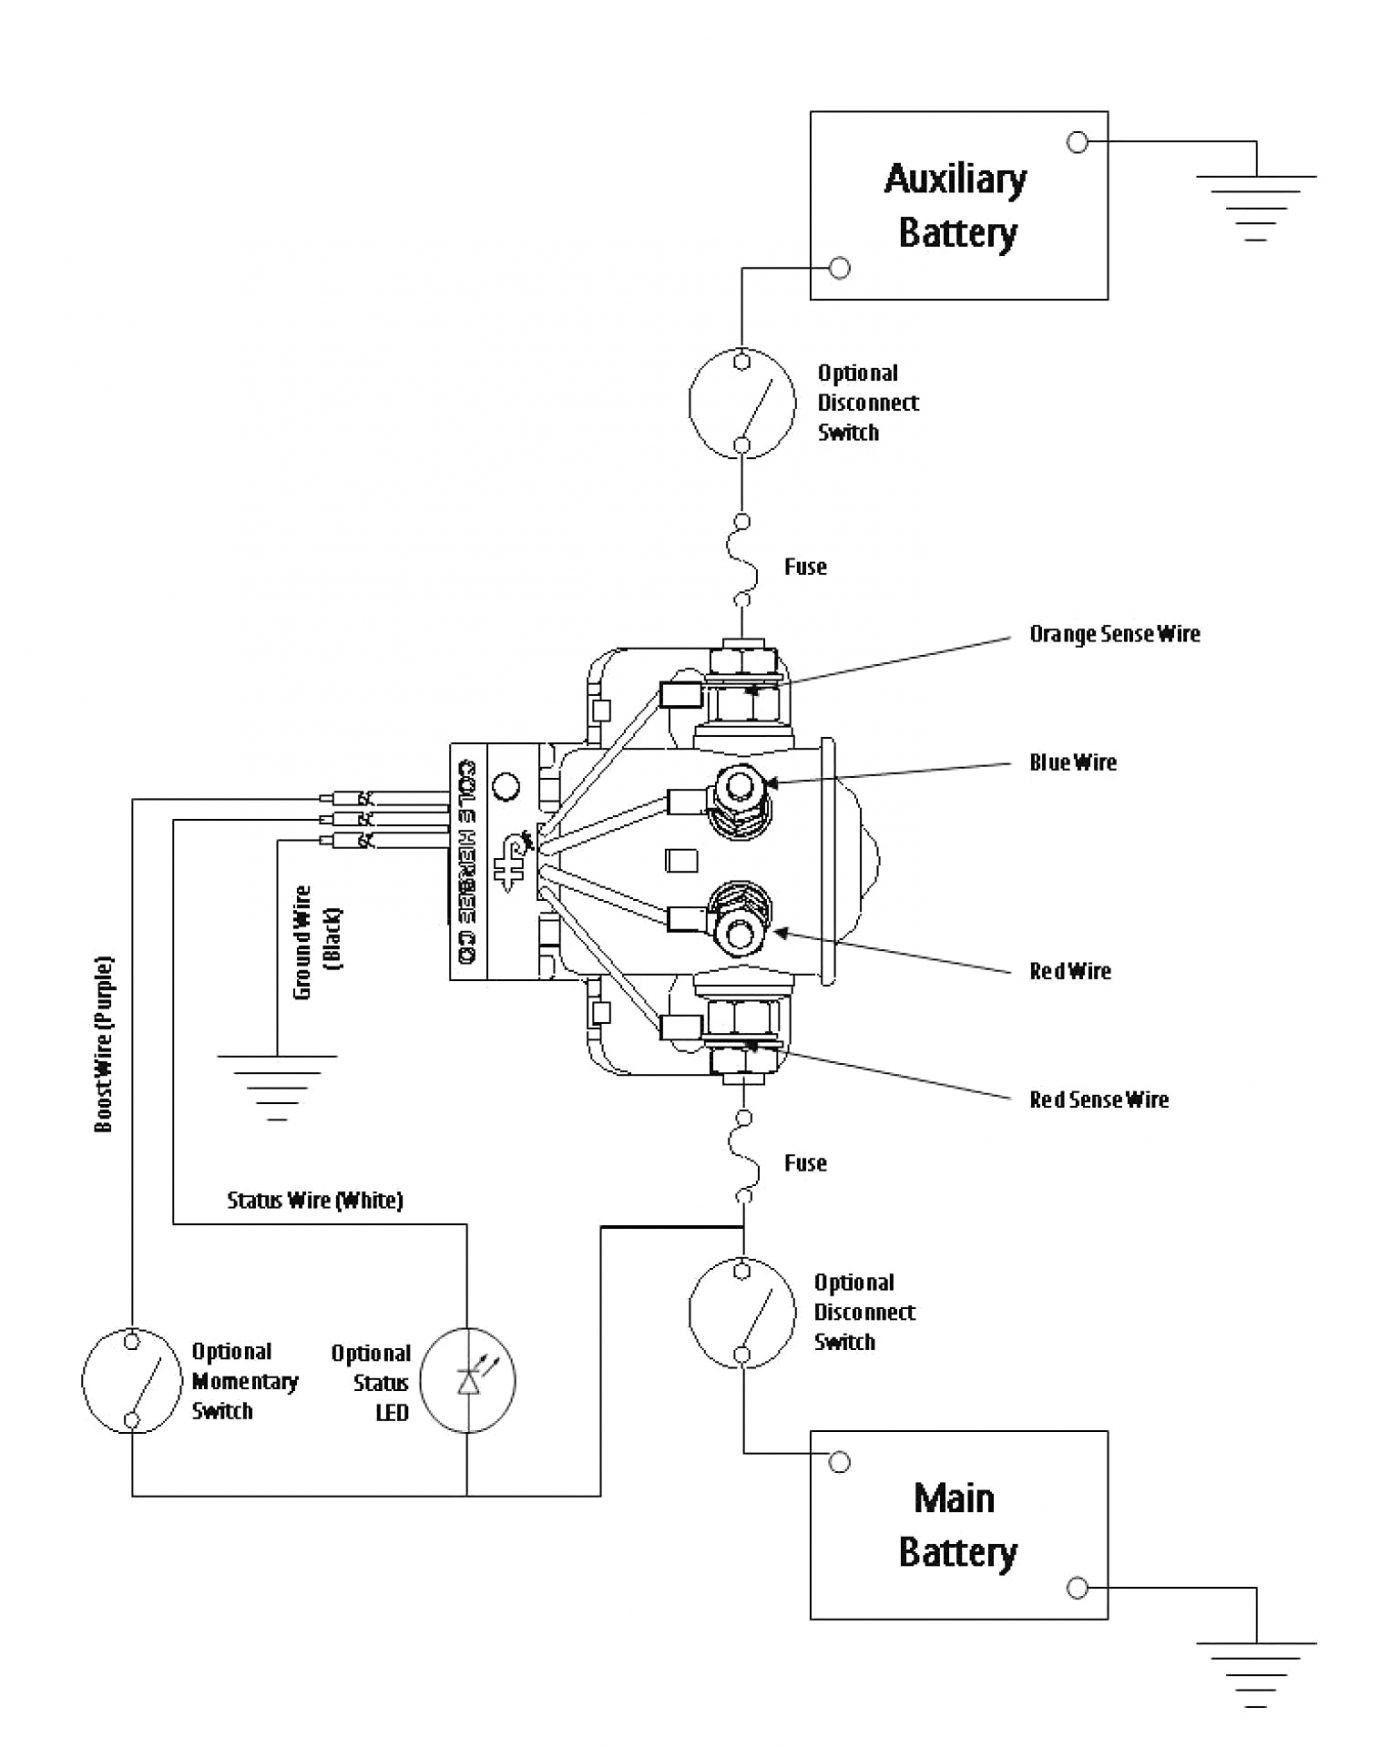 Wiring Diagram Spy Car Alarm In 2020 Electrical Wiring Diagram Diagram Wire